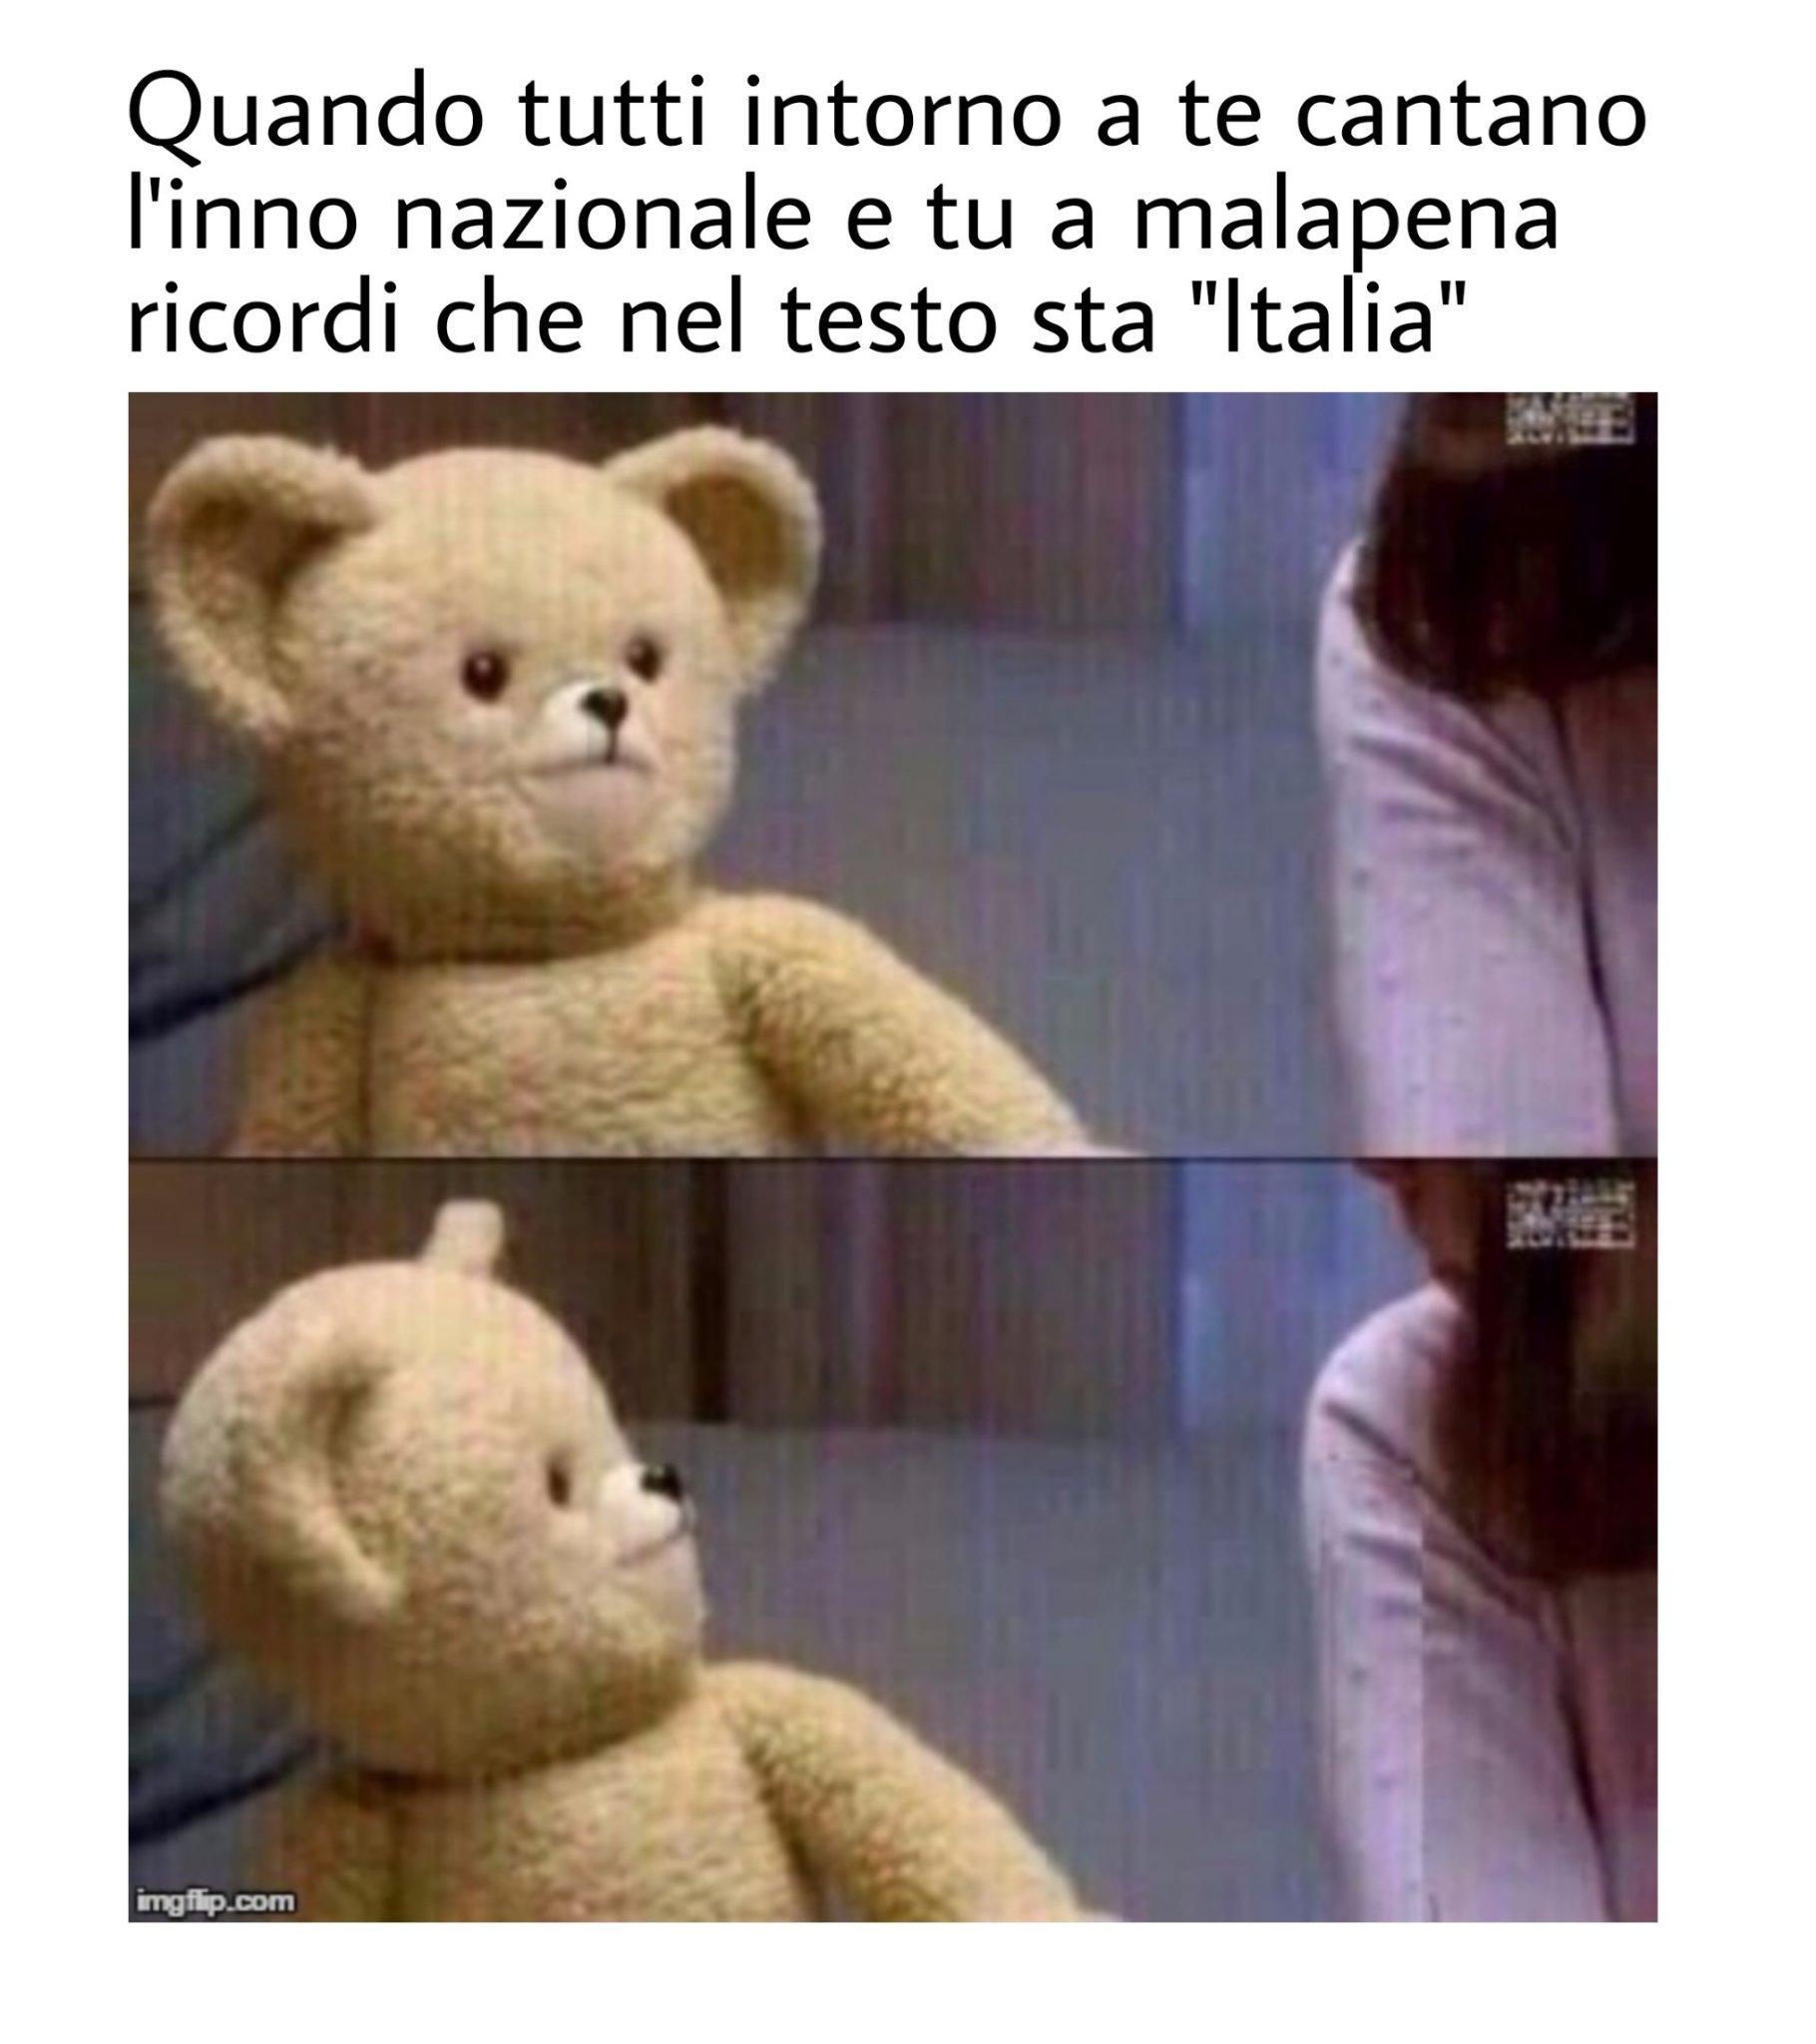 Fratelli d'Italia, l'Italia...e poi? - meme